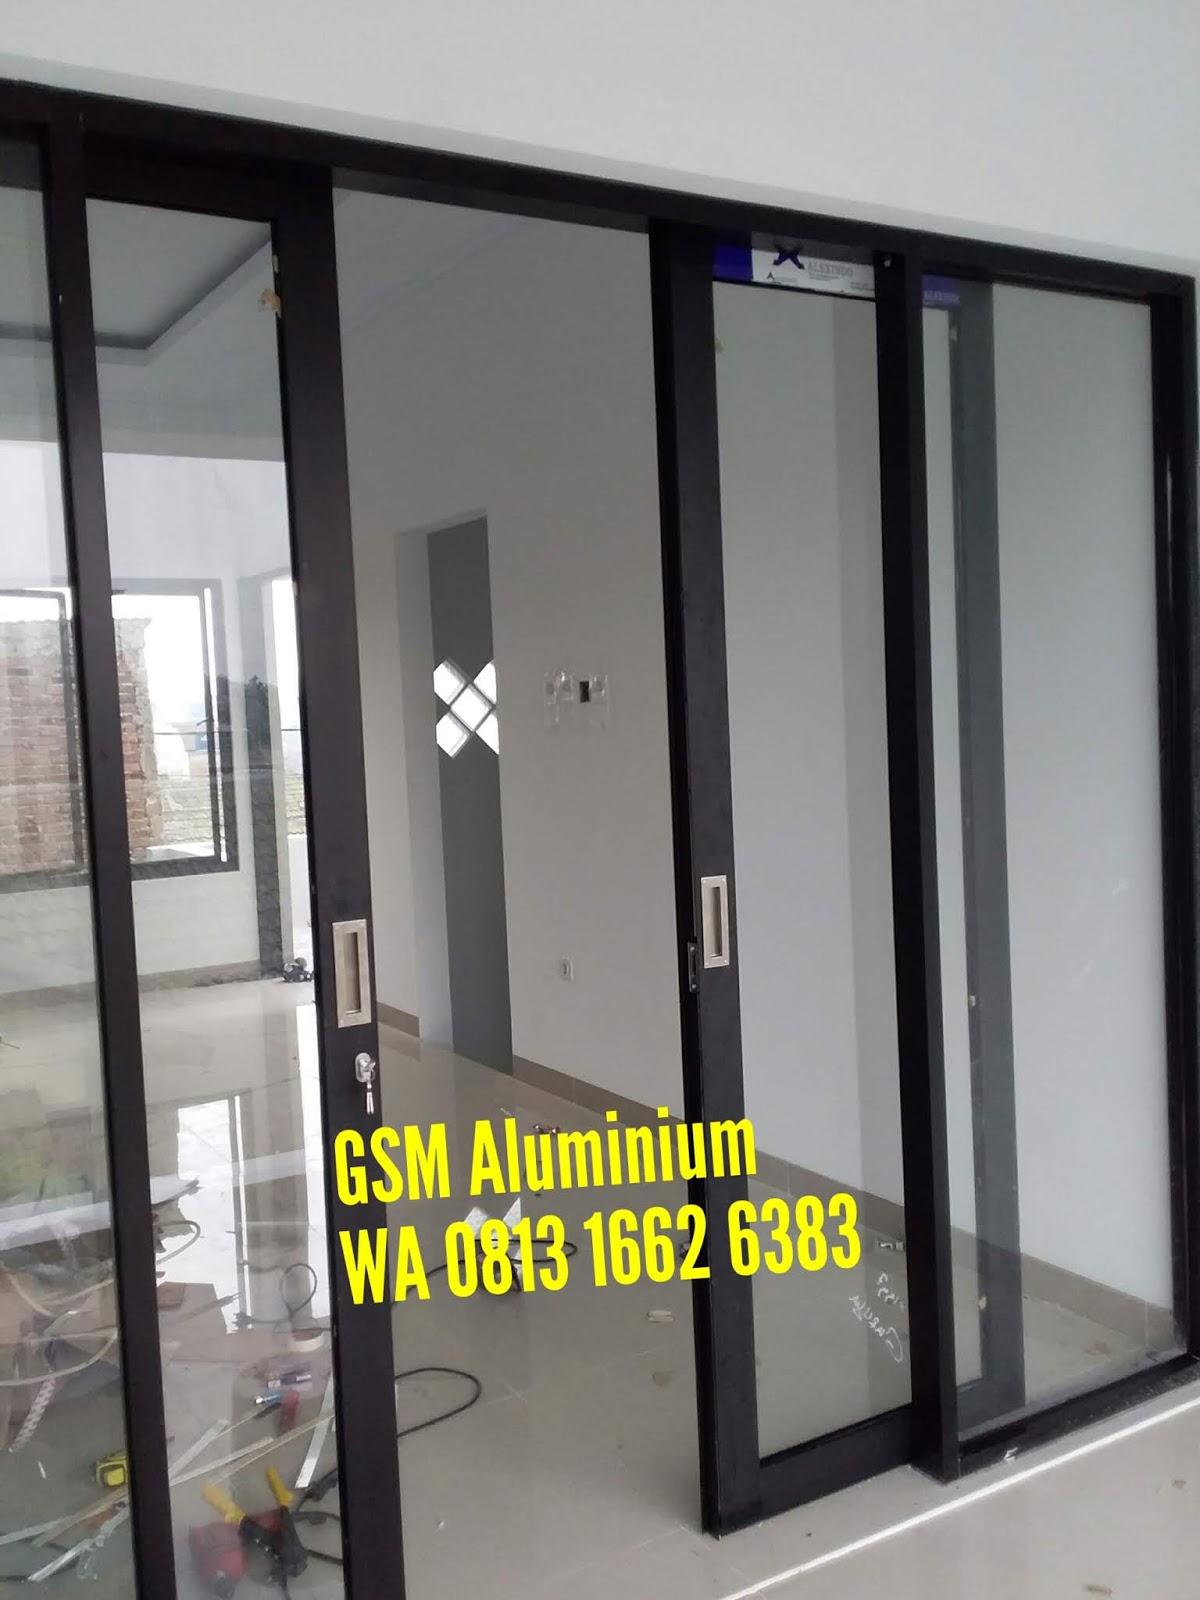 KUSEN ALUMINIUM GARUDA: Harga Kusen Aluminium Rp 70.000/m ...